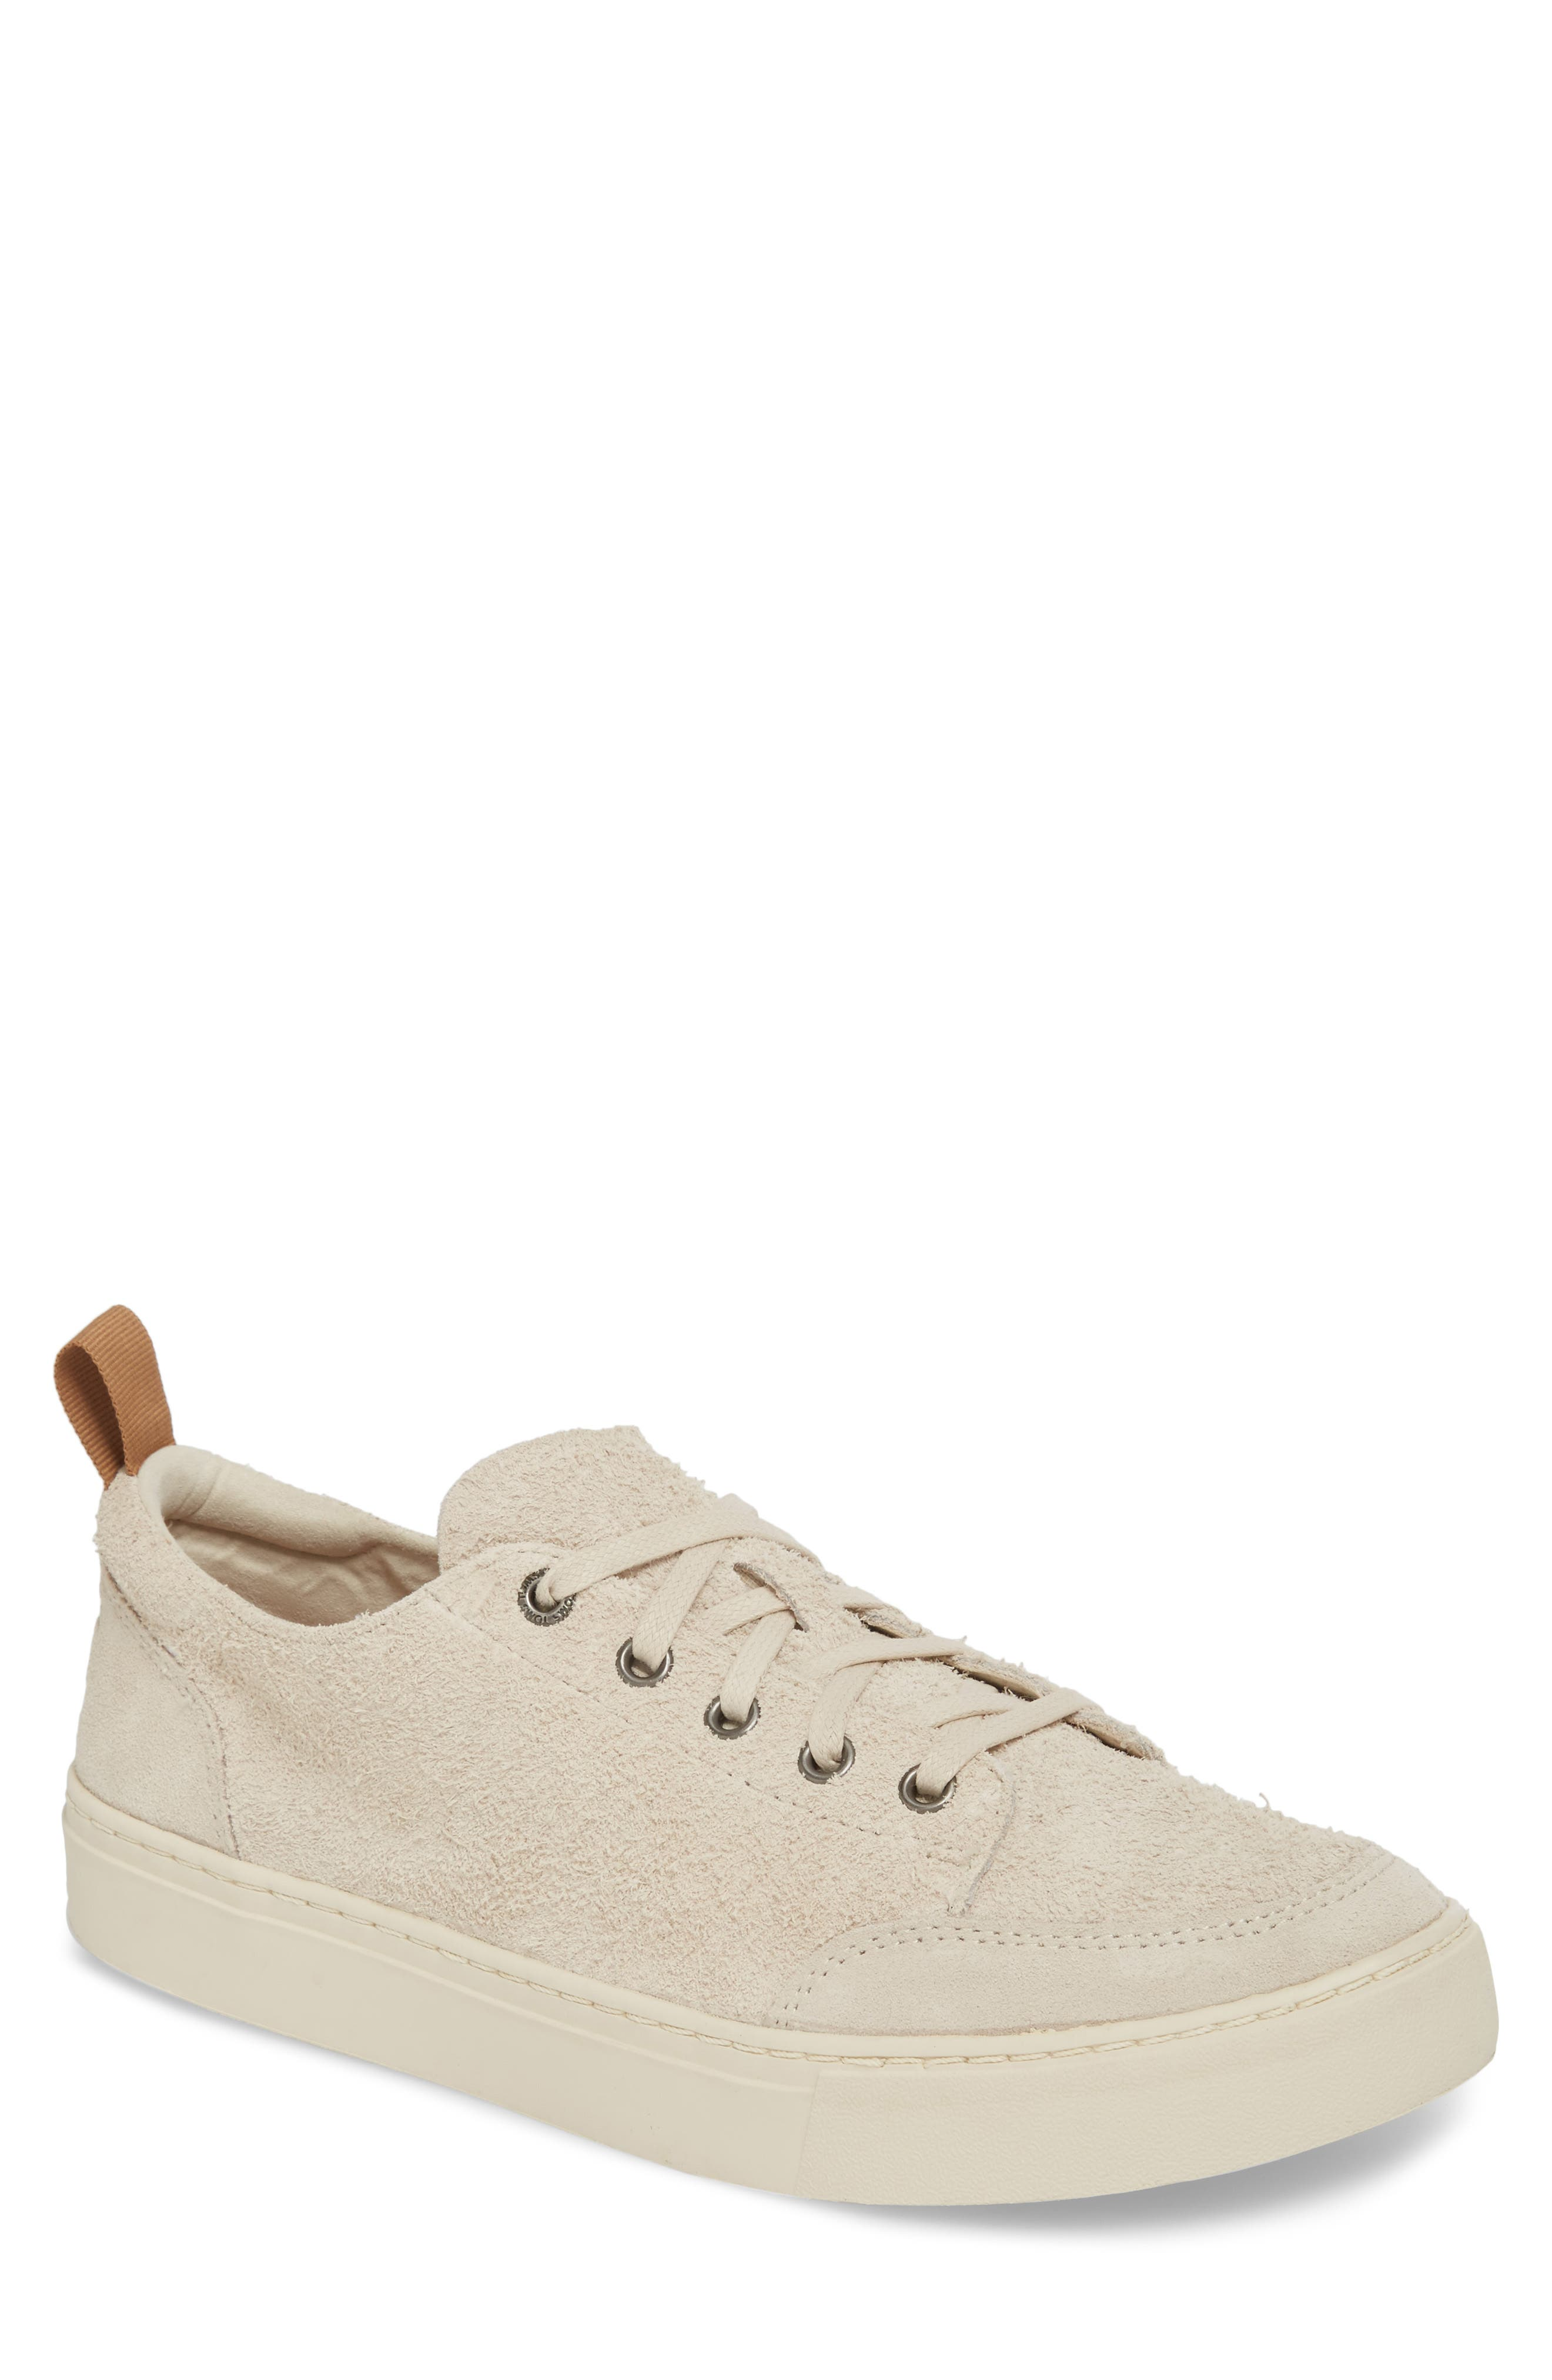 Landen Sneaker,                             Main thumbnail 1, color,                             BIRCH SHAGGY SUEDE